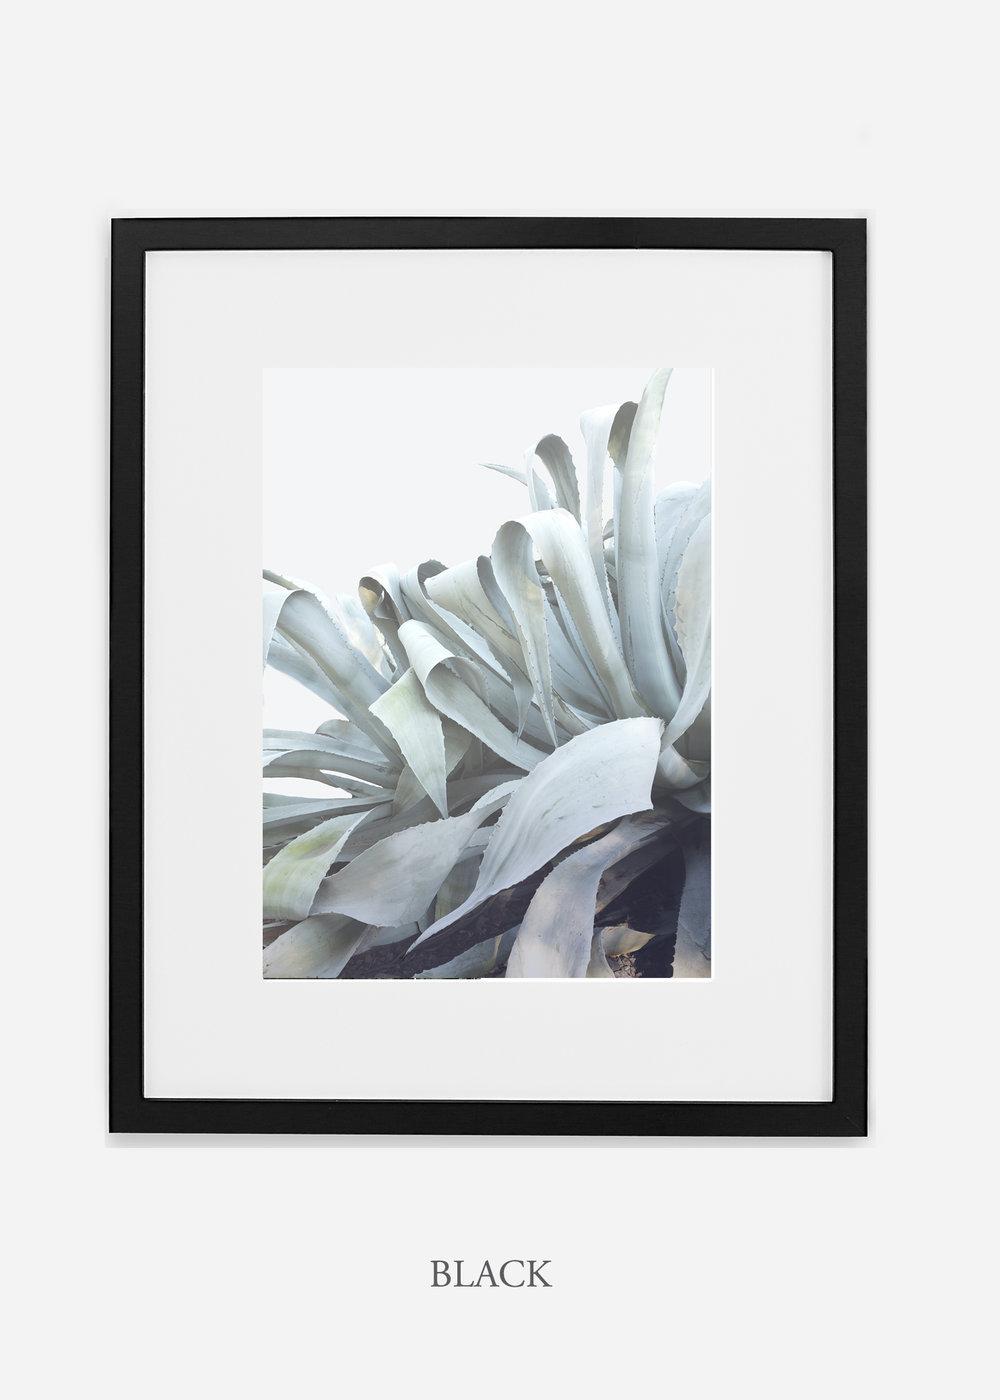 wildercalifornia_blackframe_WinterWhite_AgaveNo.2_Desert_LosAngeles_Art_HomeDecor_interiordesign_design.jpg